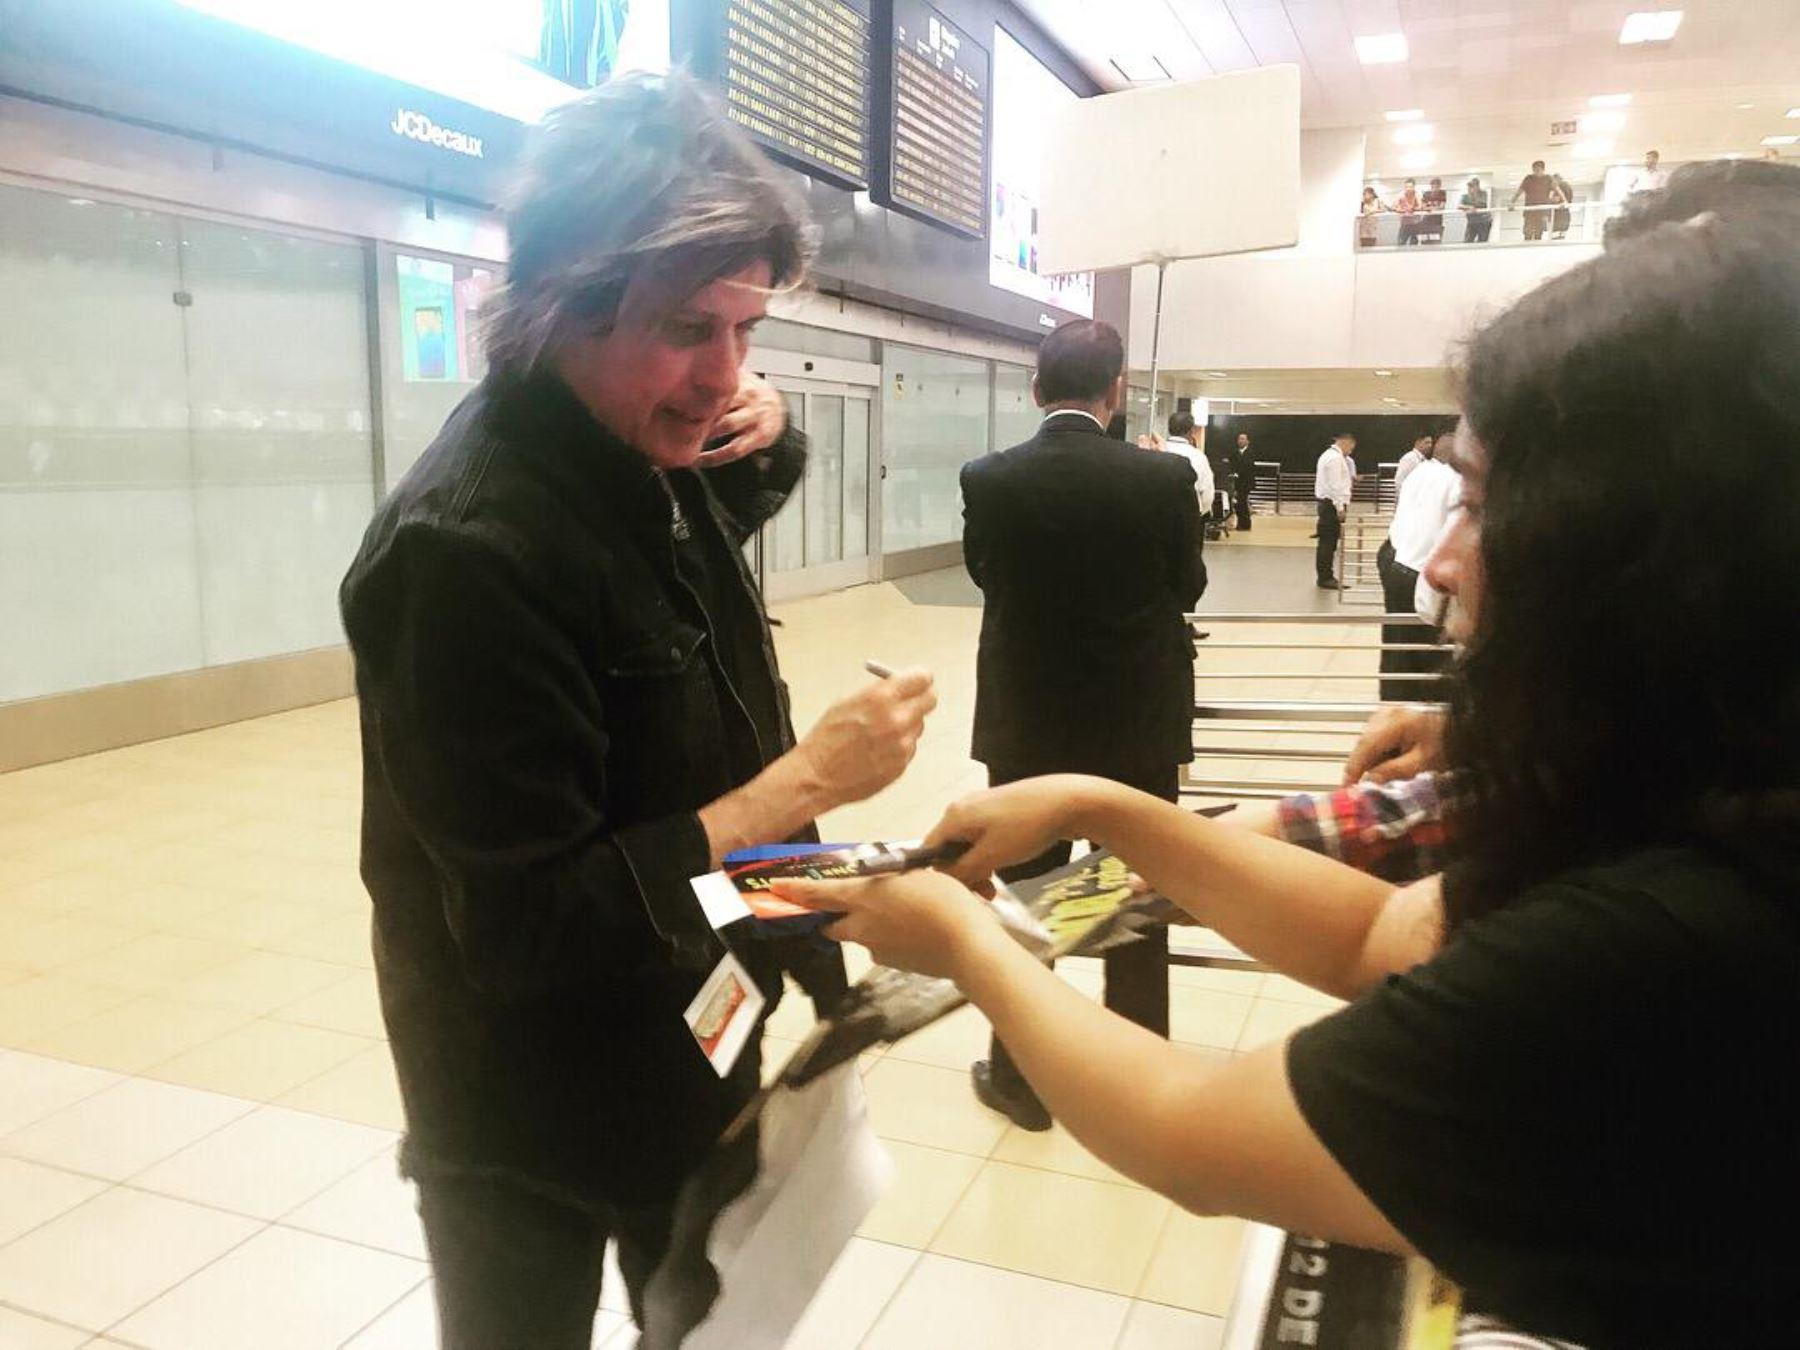 Los integrantes de Stone Temple Pilots llegaron al Perú.